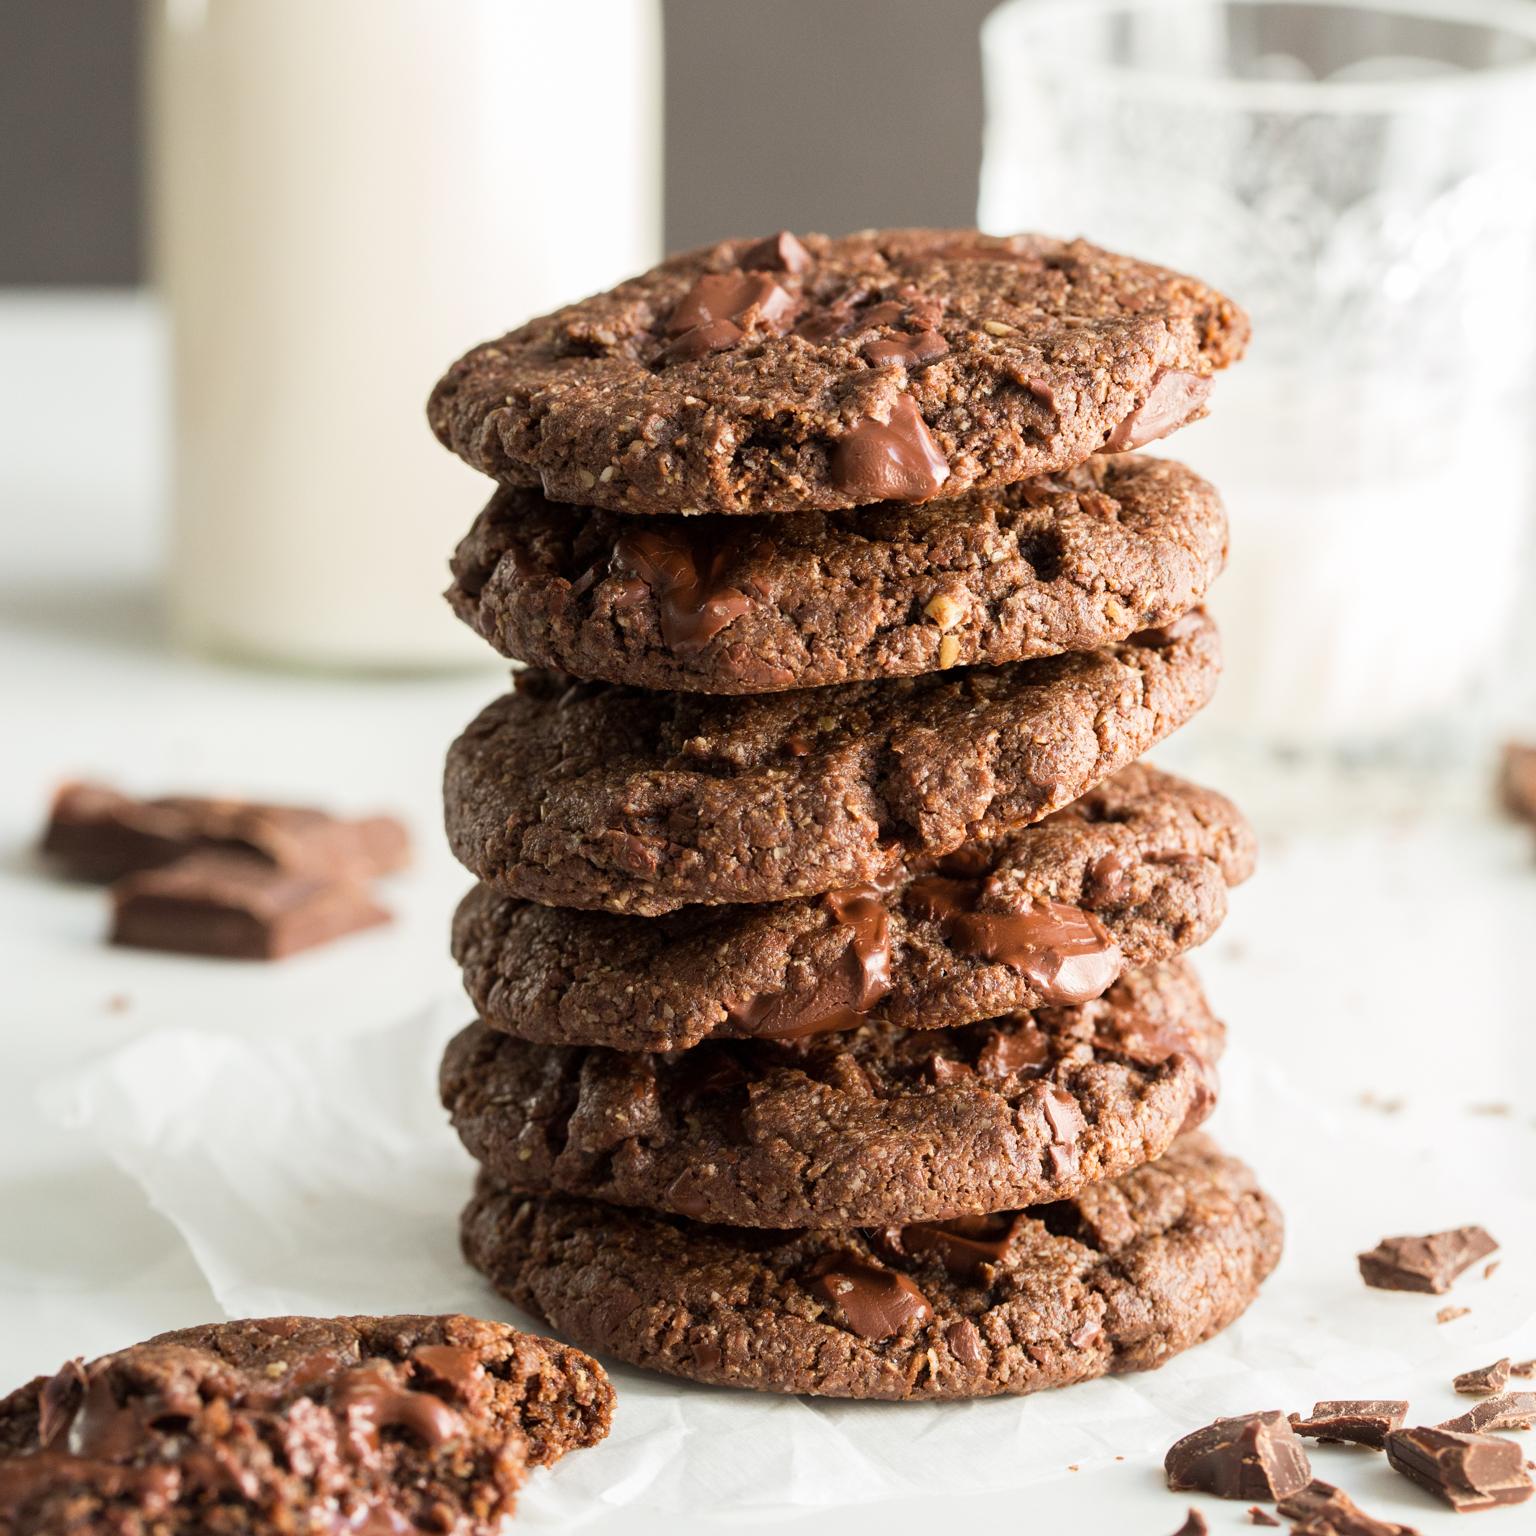 How To Make Double Chocolate Chunk Cookies